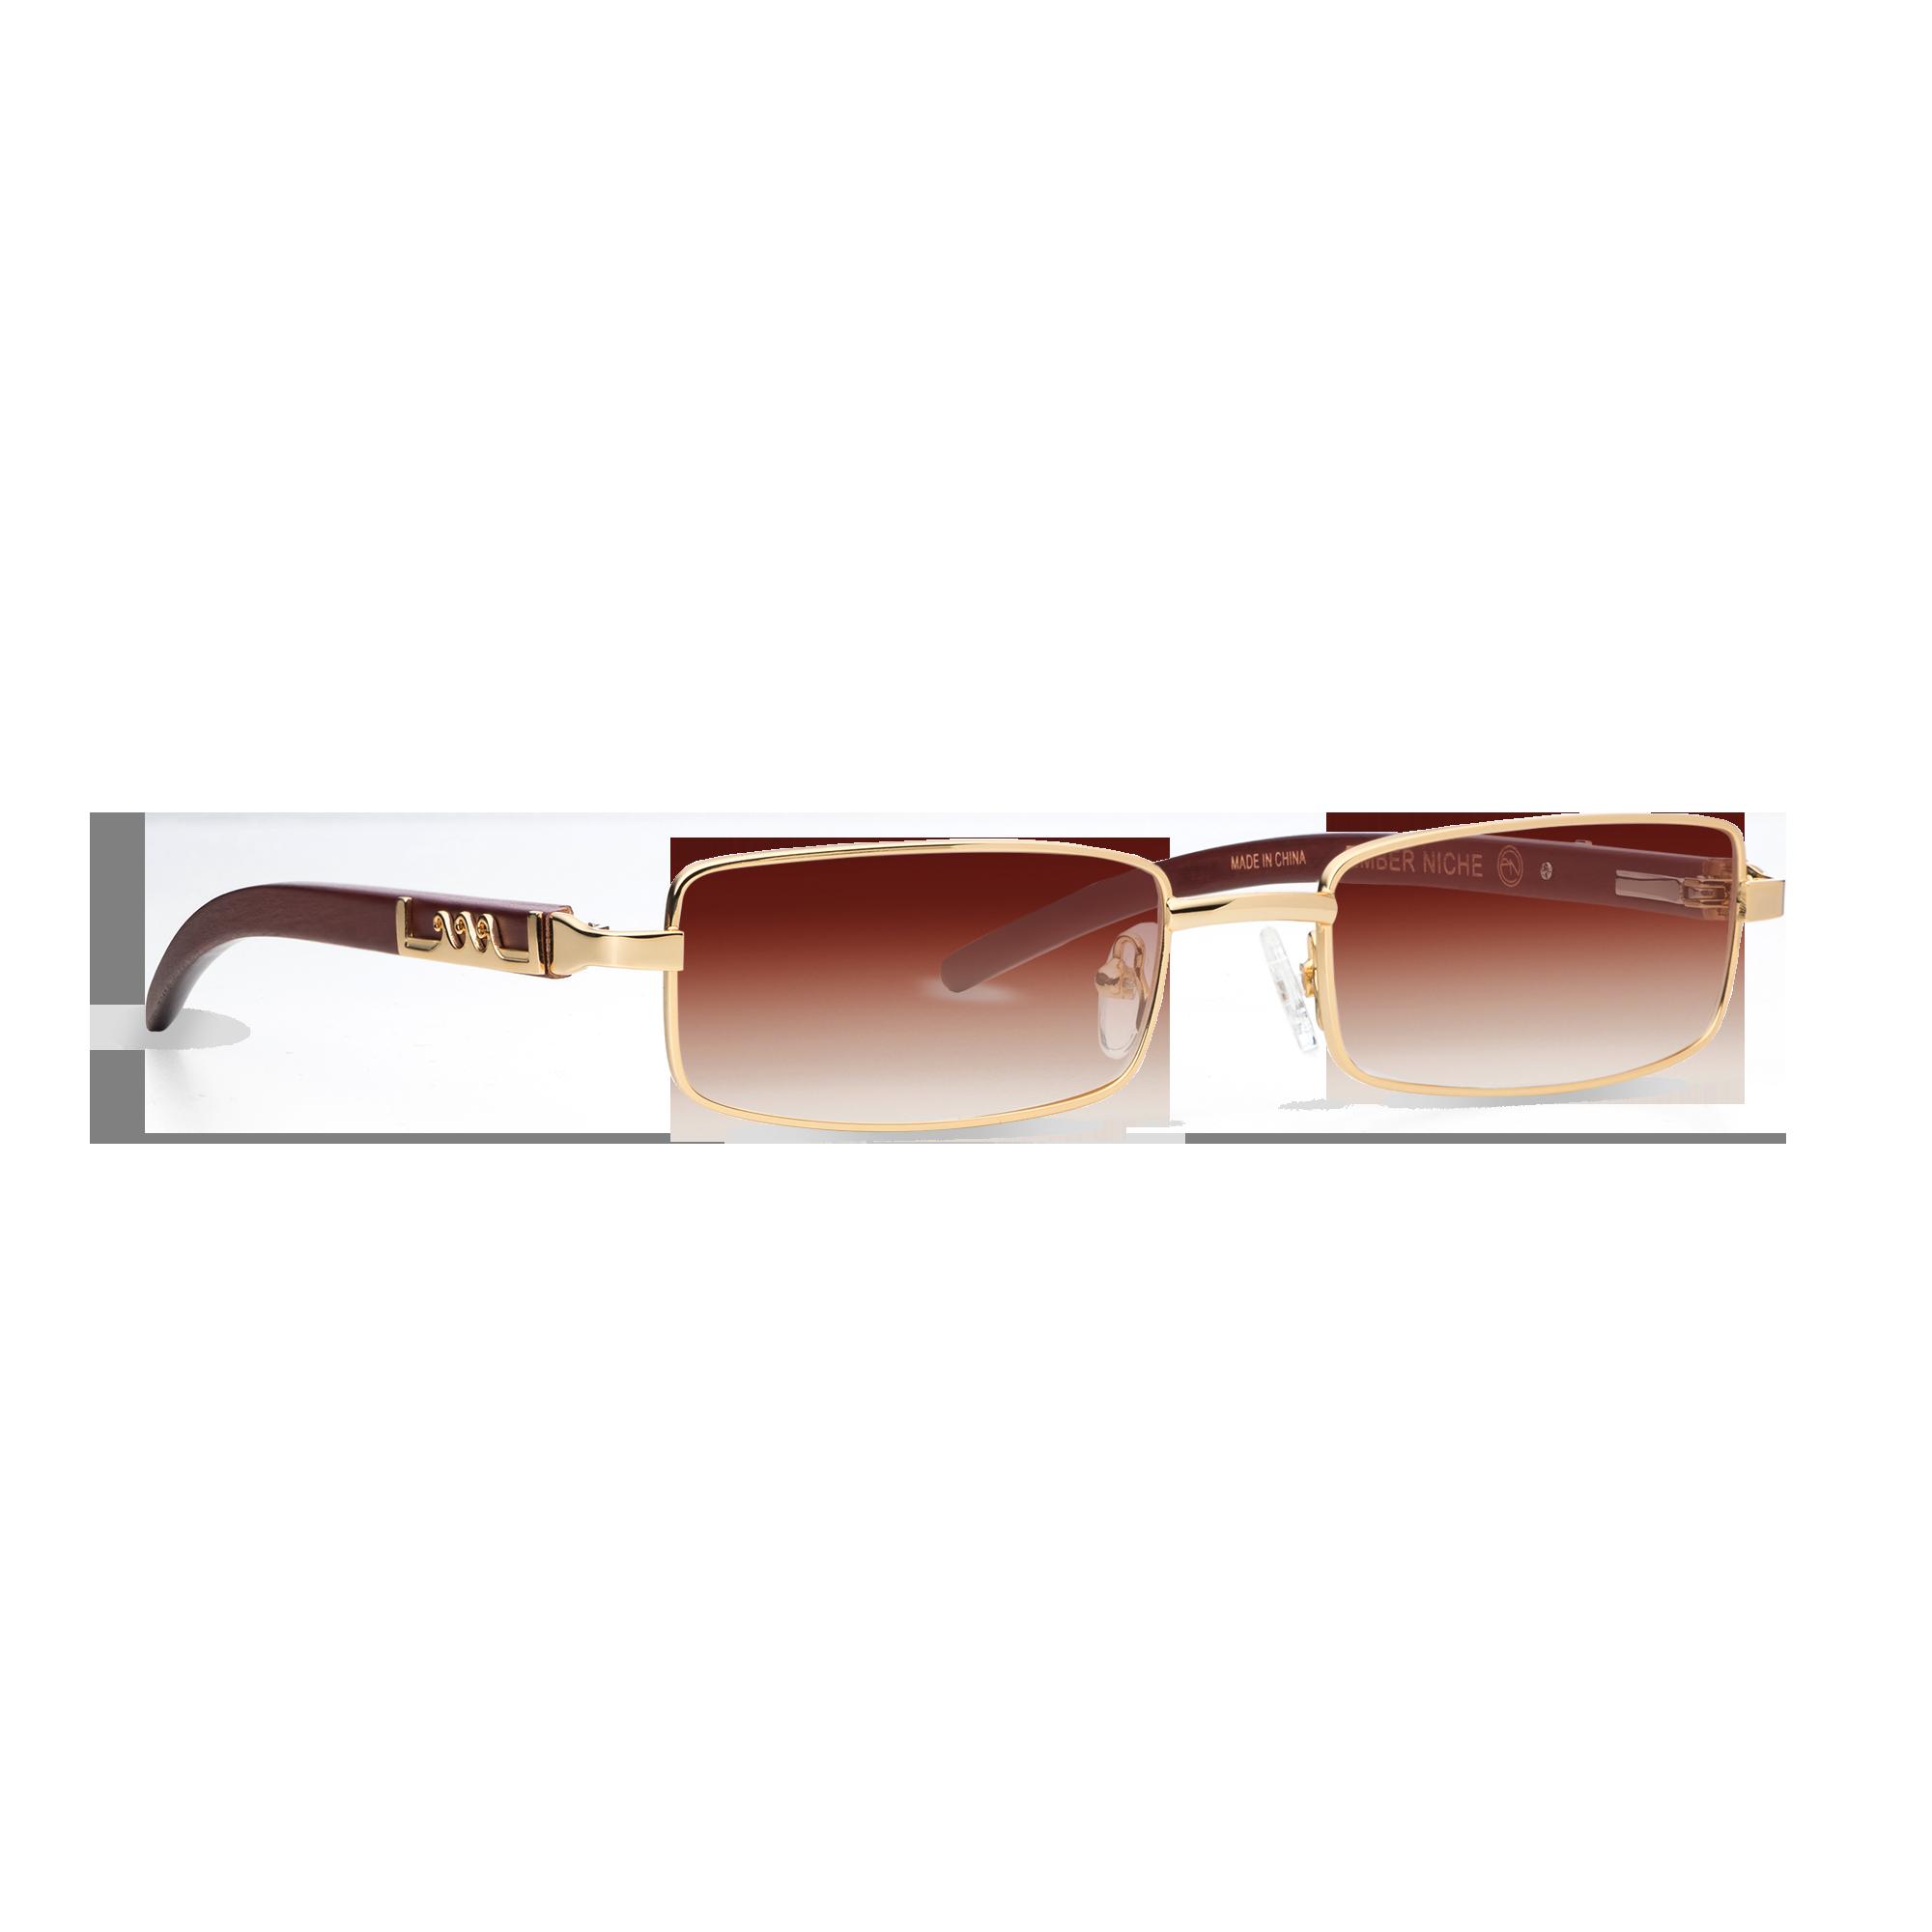 gold sunglasses product photo